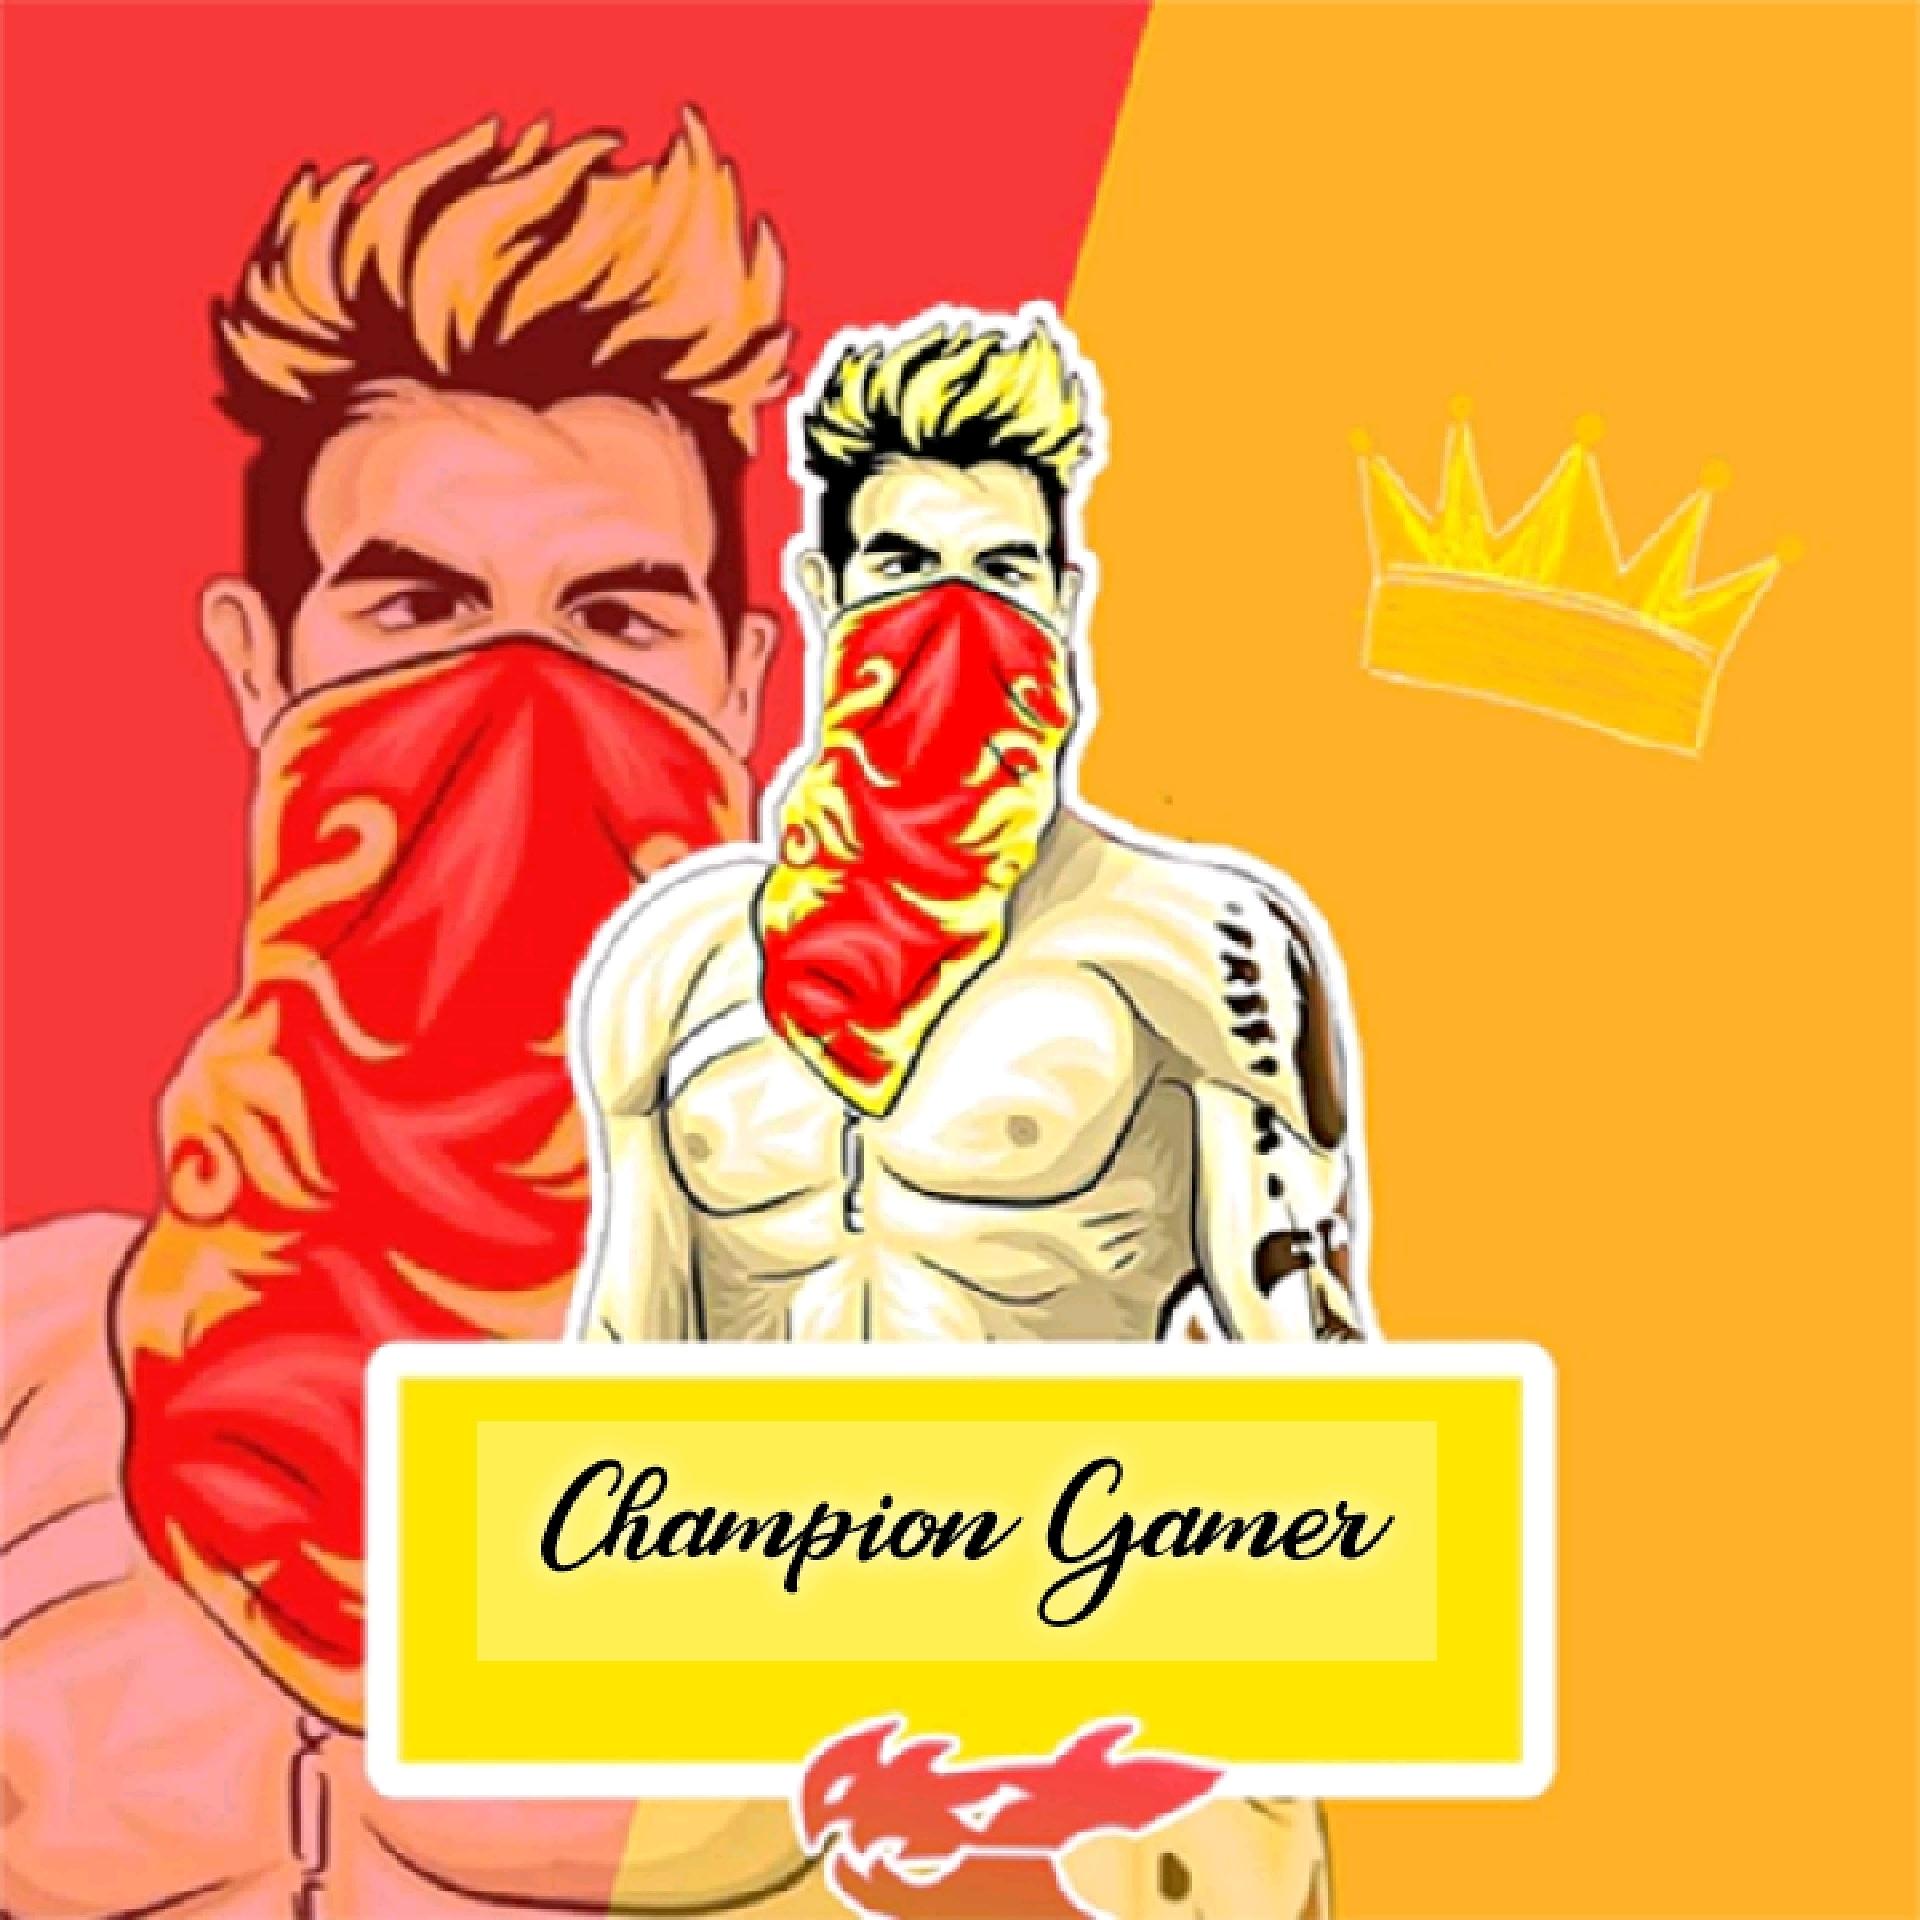 Champion Gamer